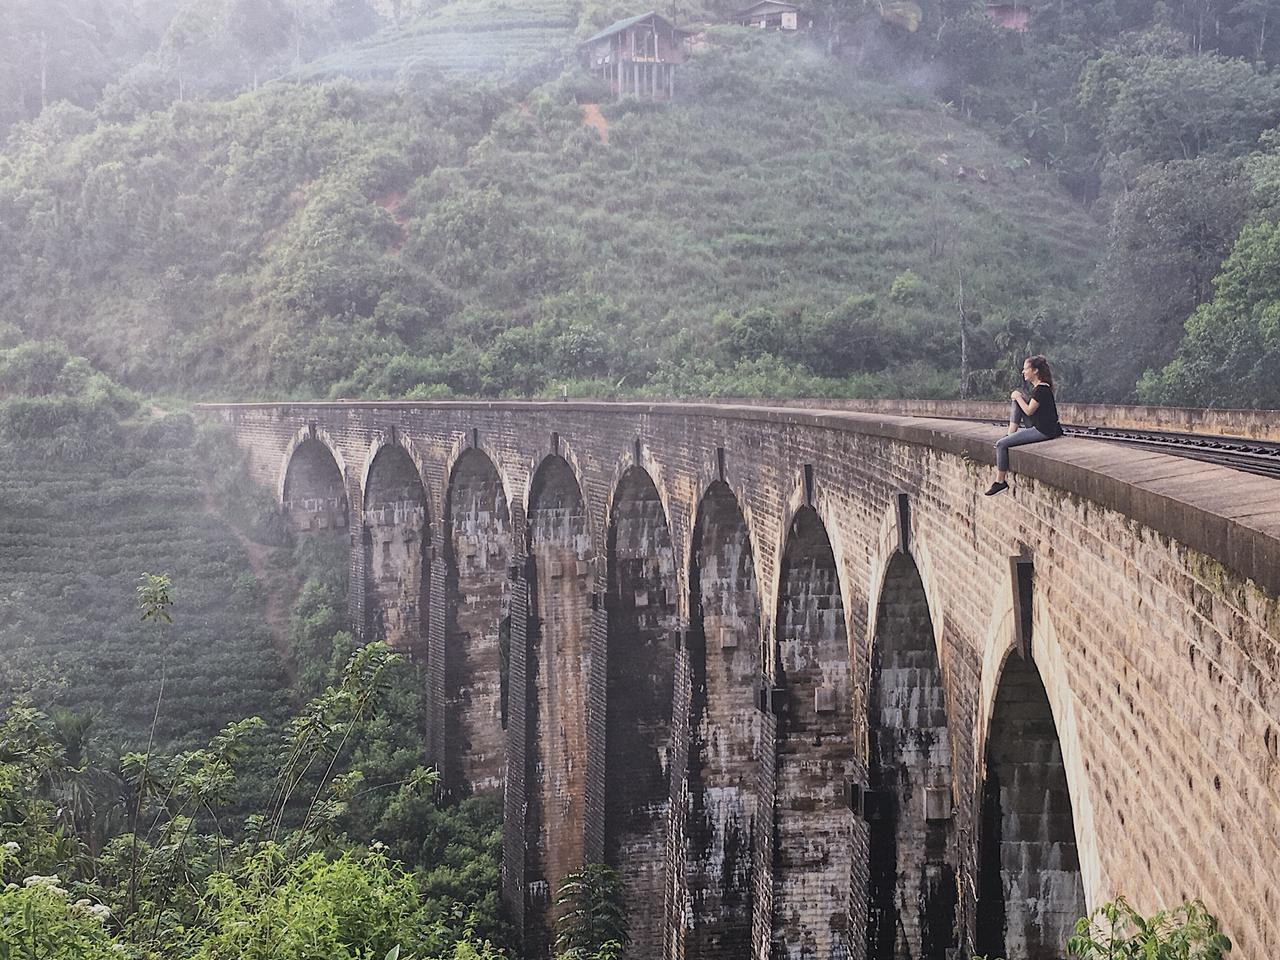 Sri Lanka travel hacks & know hows